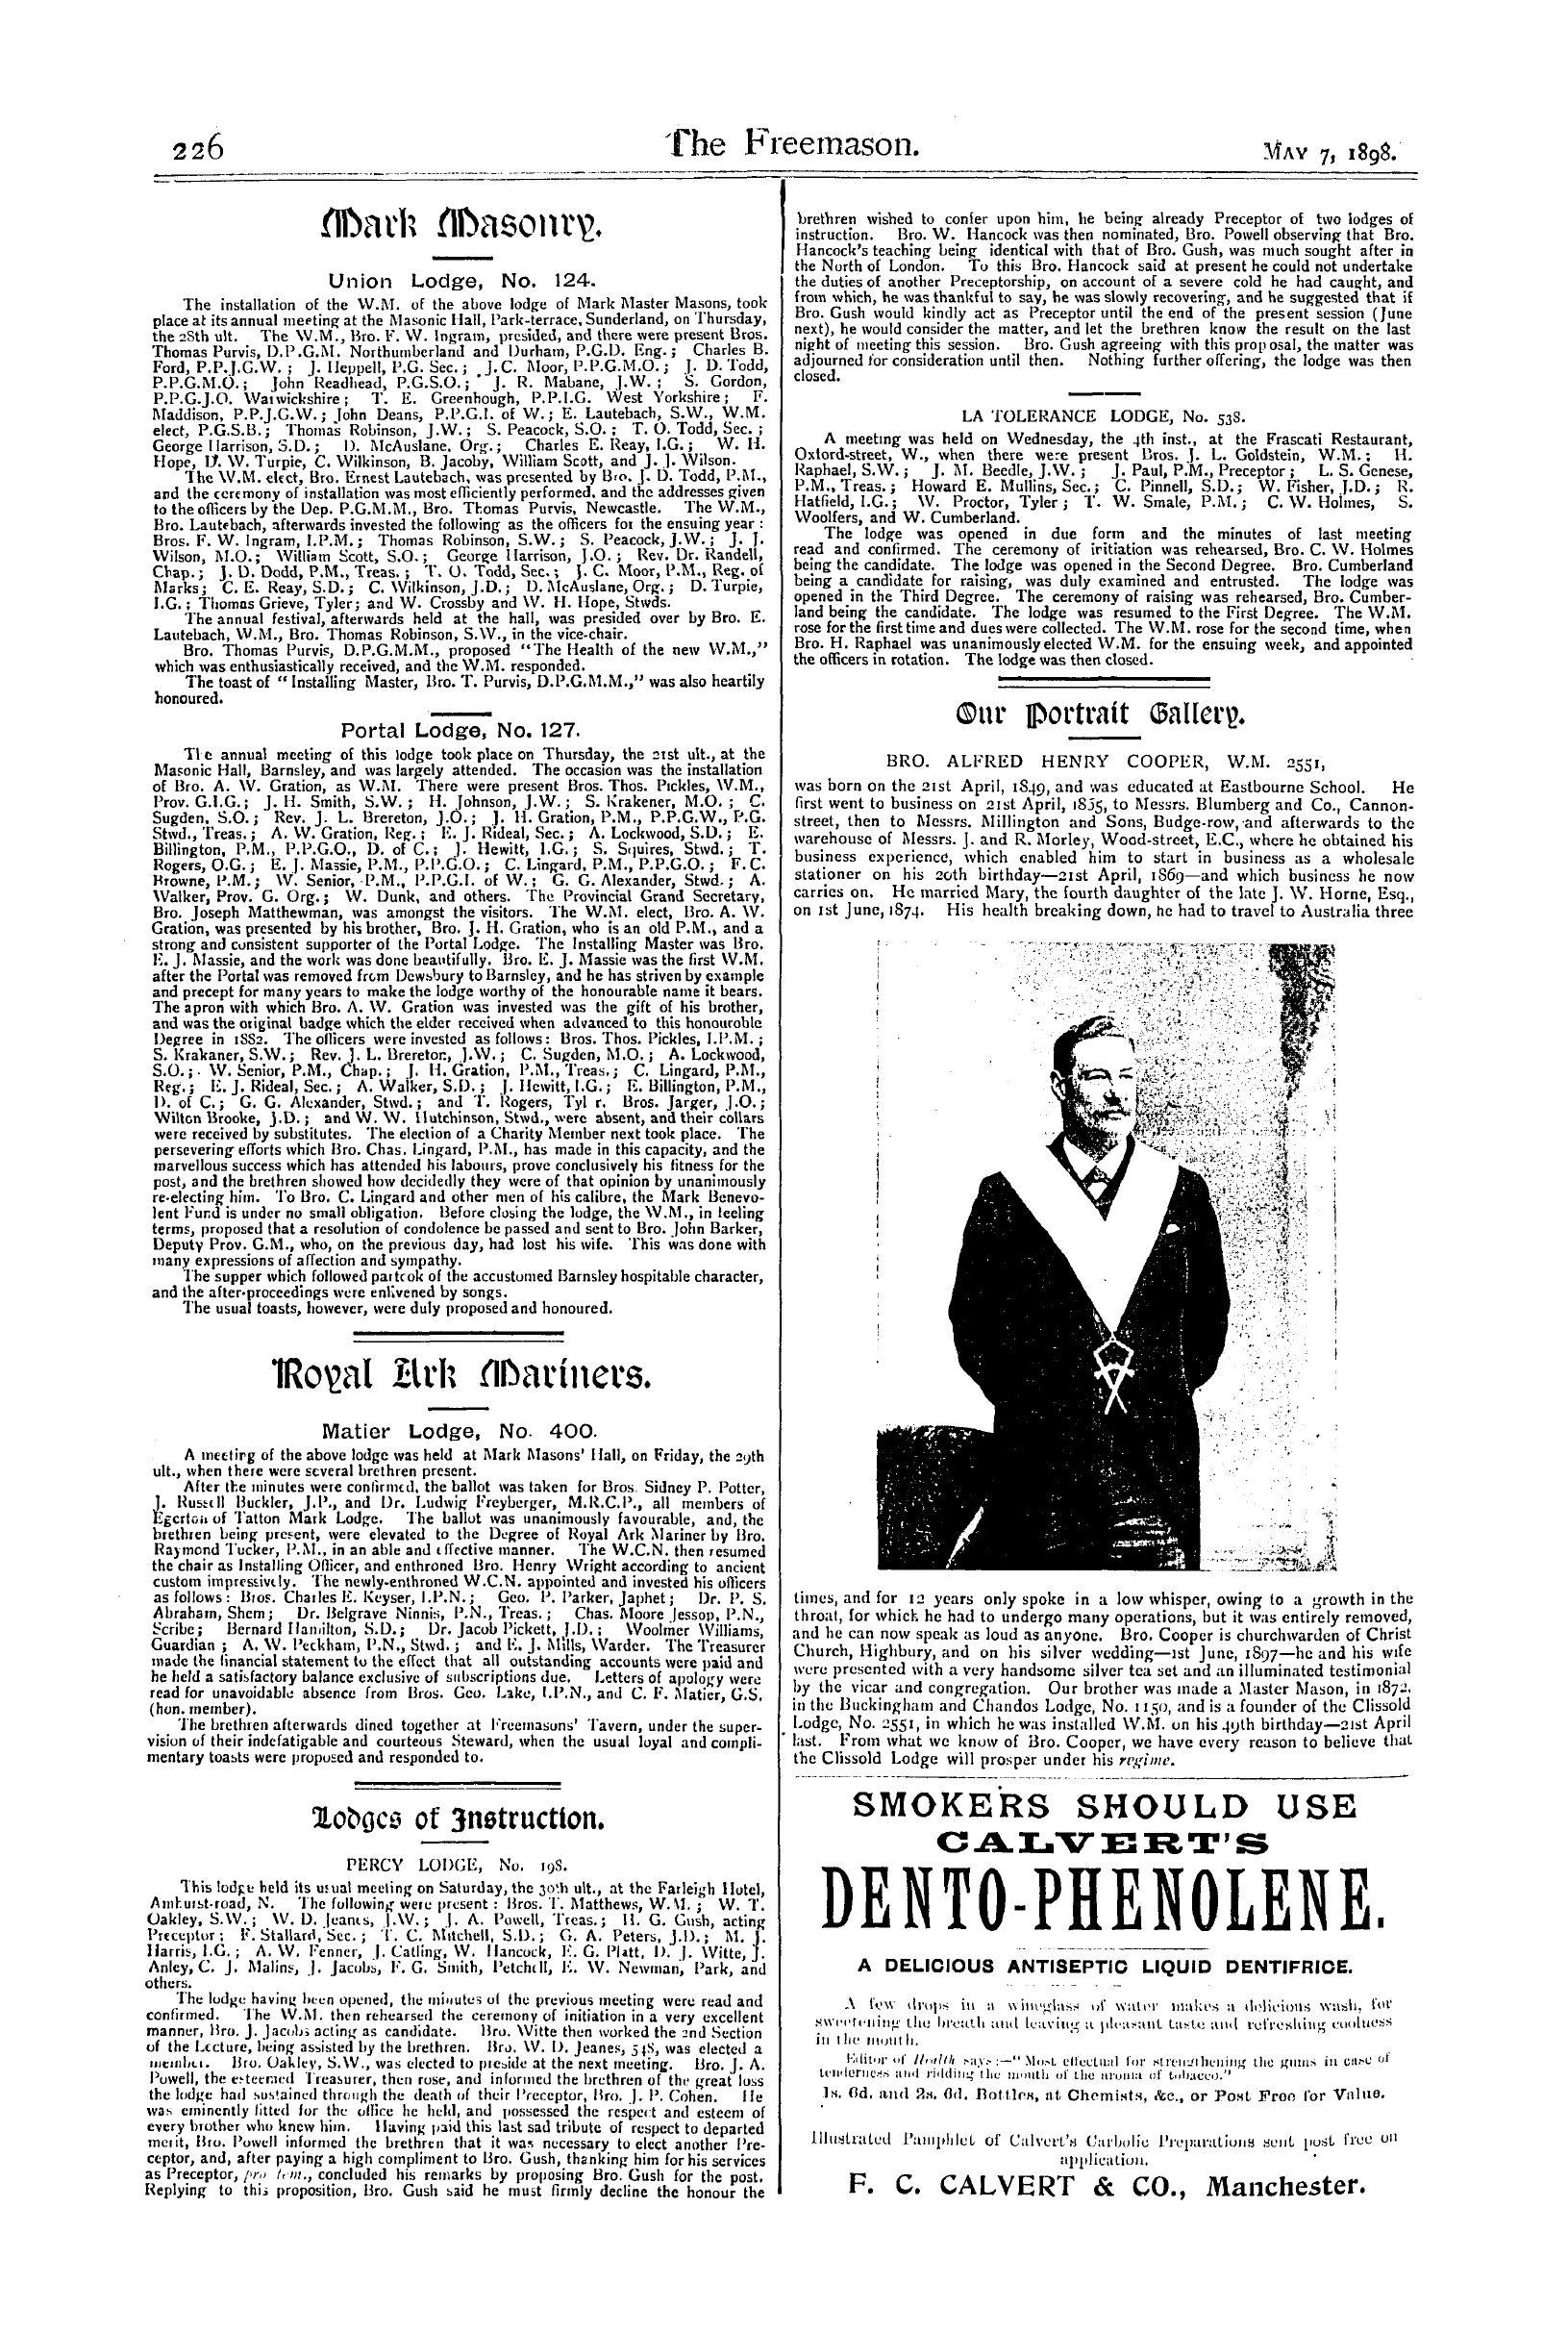 Financial Periodicals the Freemason May 7 1898 Page 10